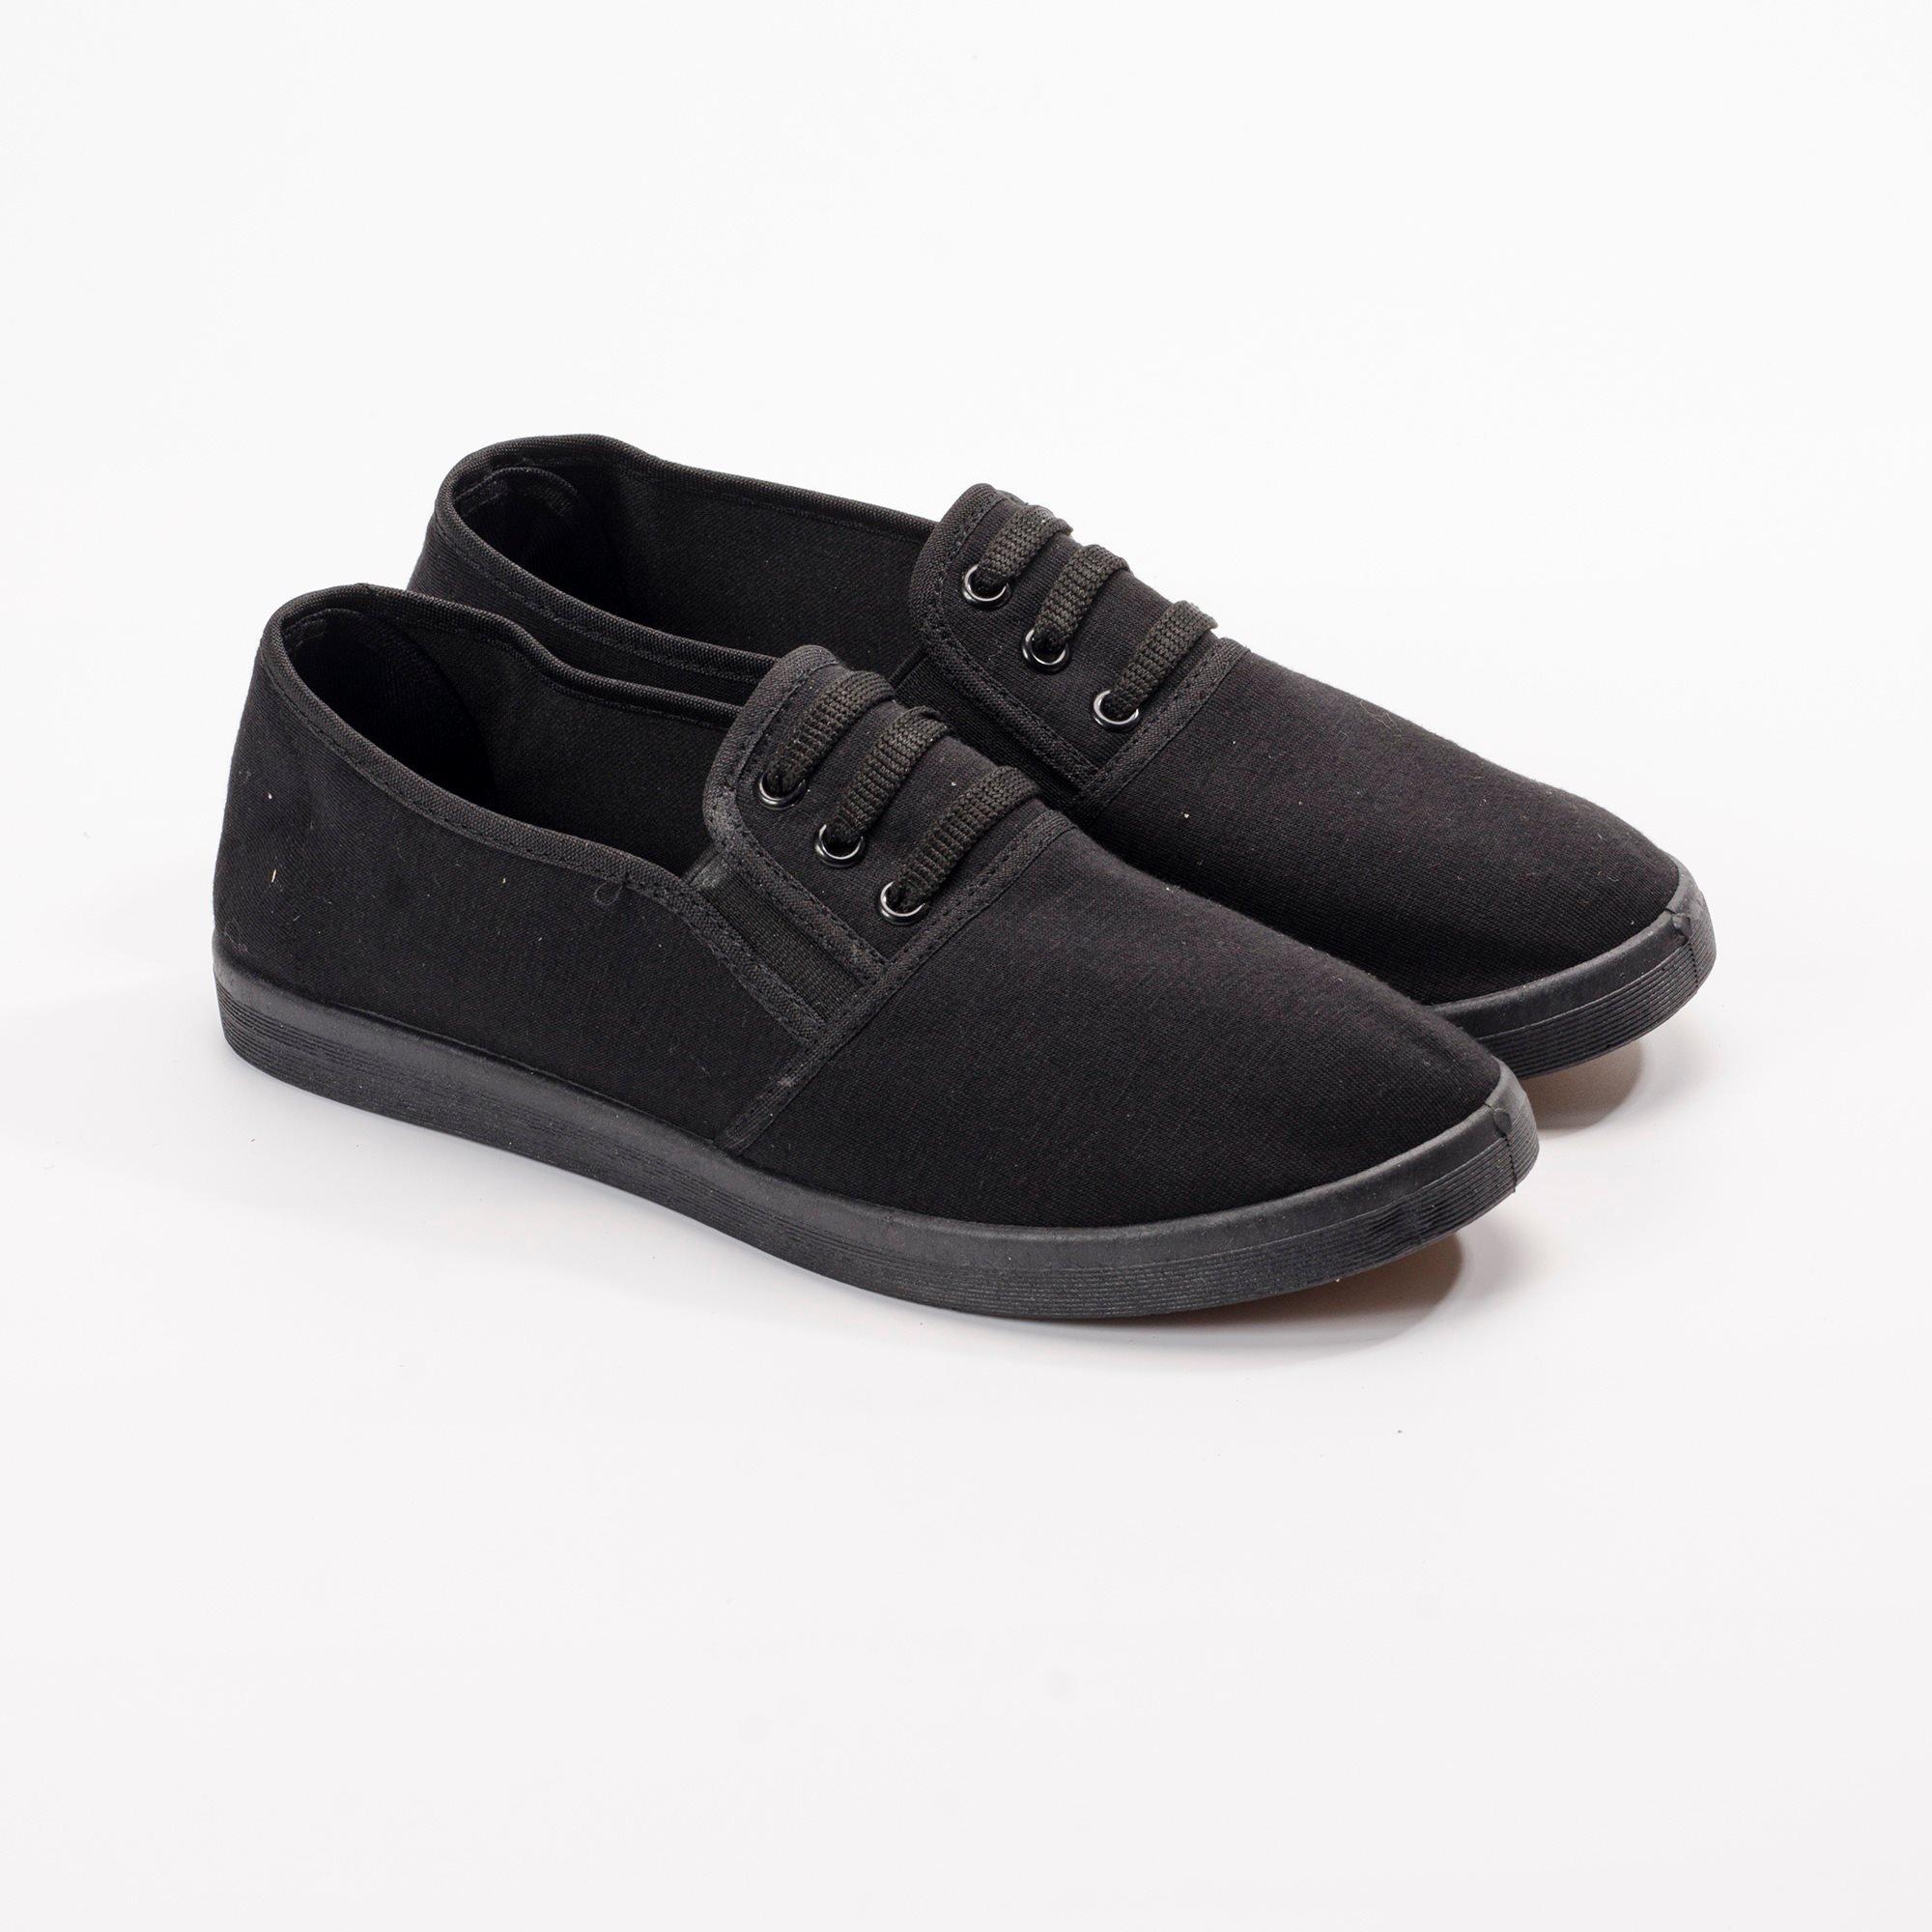 Giày Slipon nữ  MWC NUSL- 1511 - ĐEN